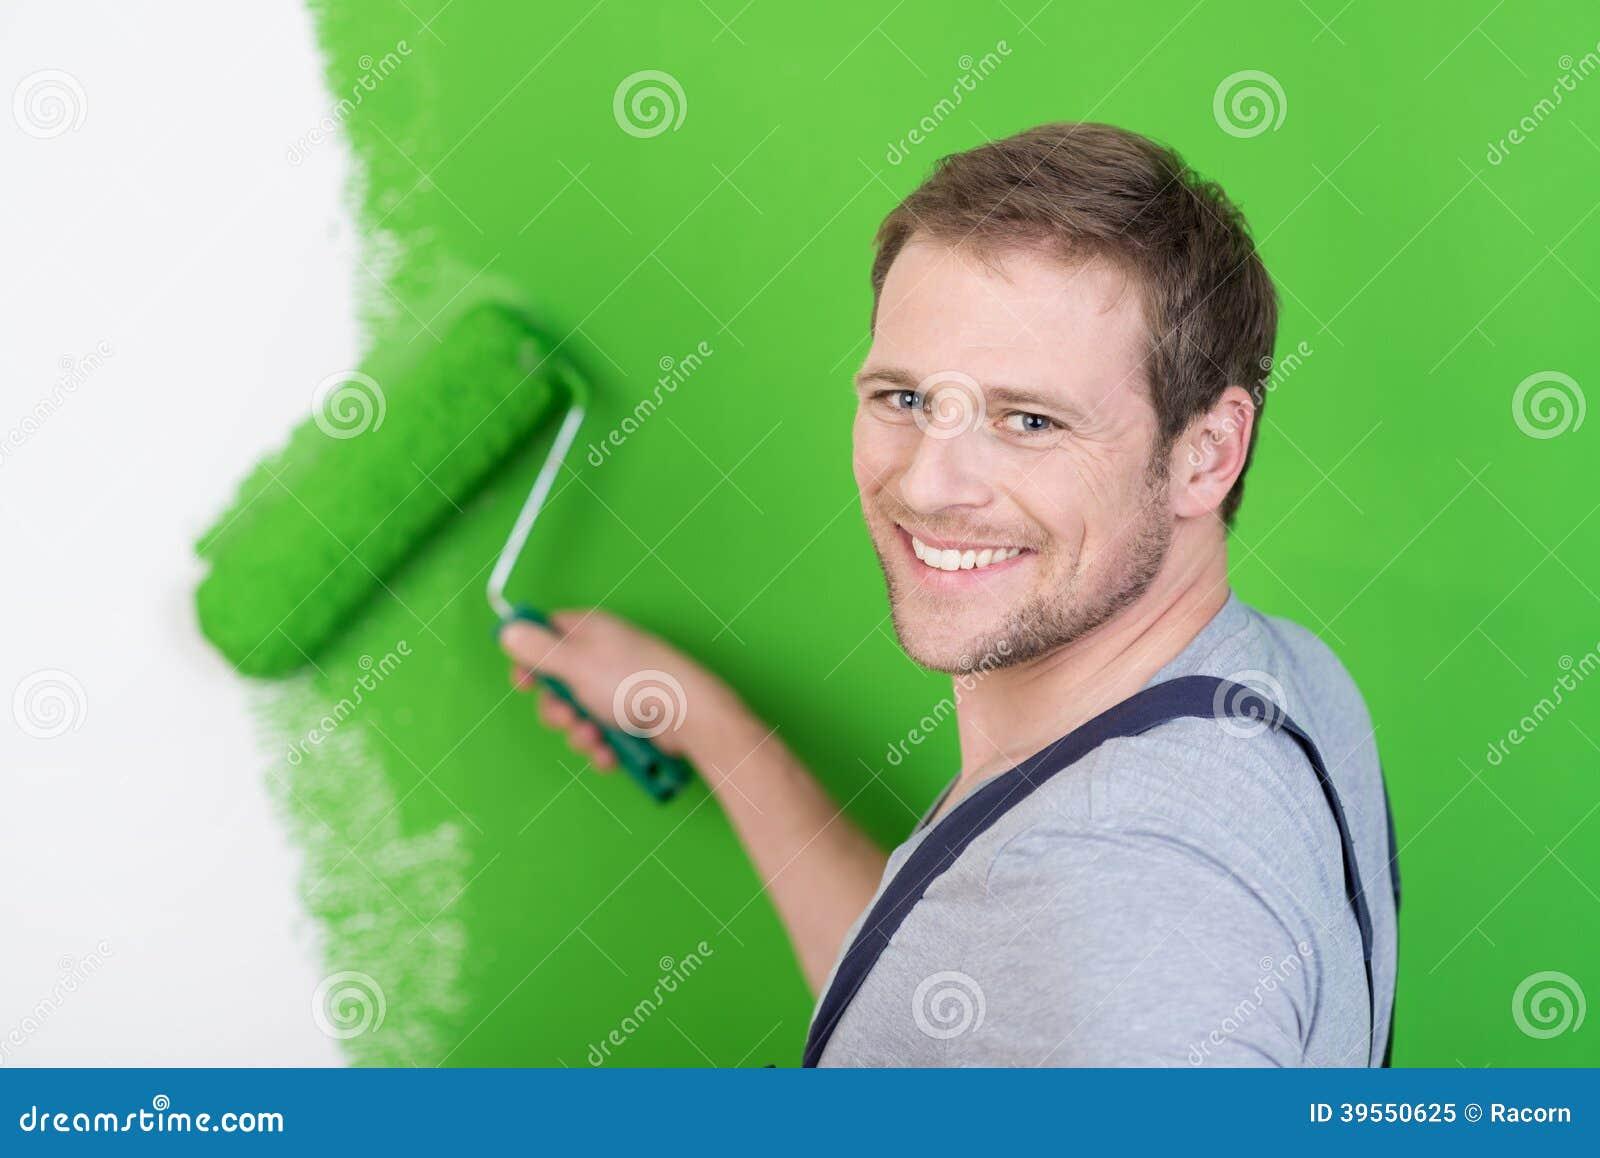 Friendly handsome handyman or painter